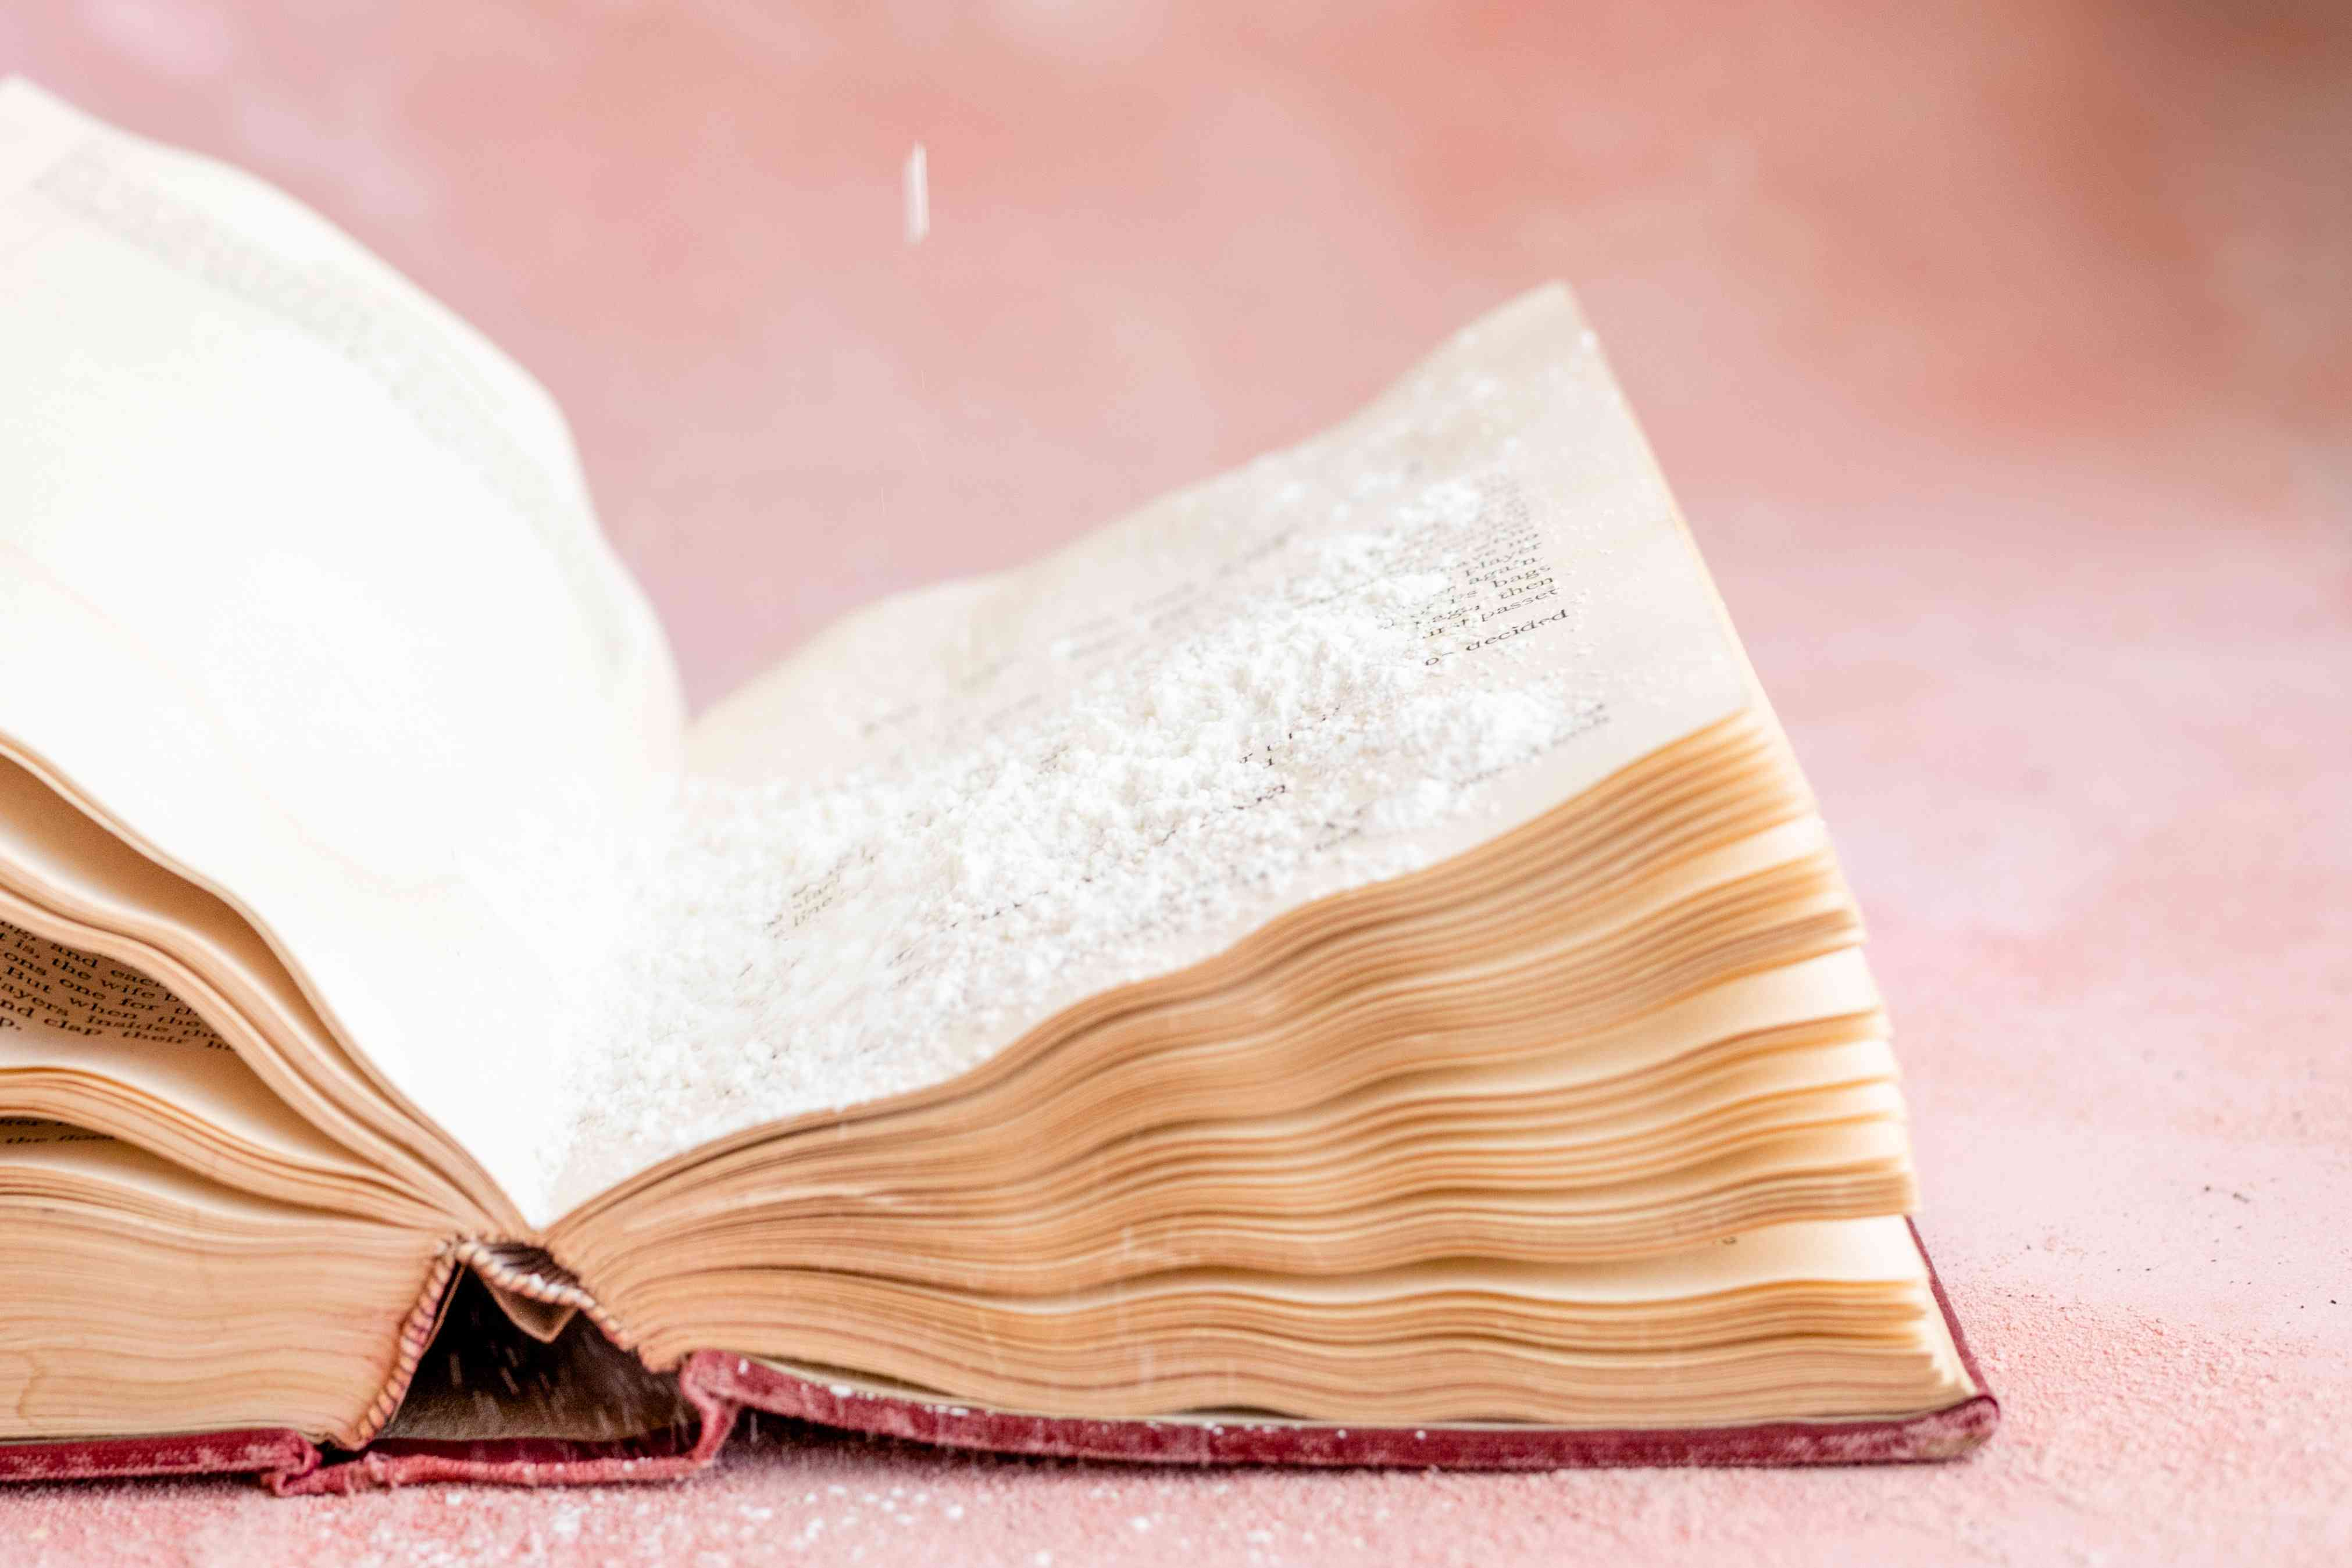 moisture damage on books